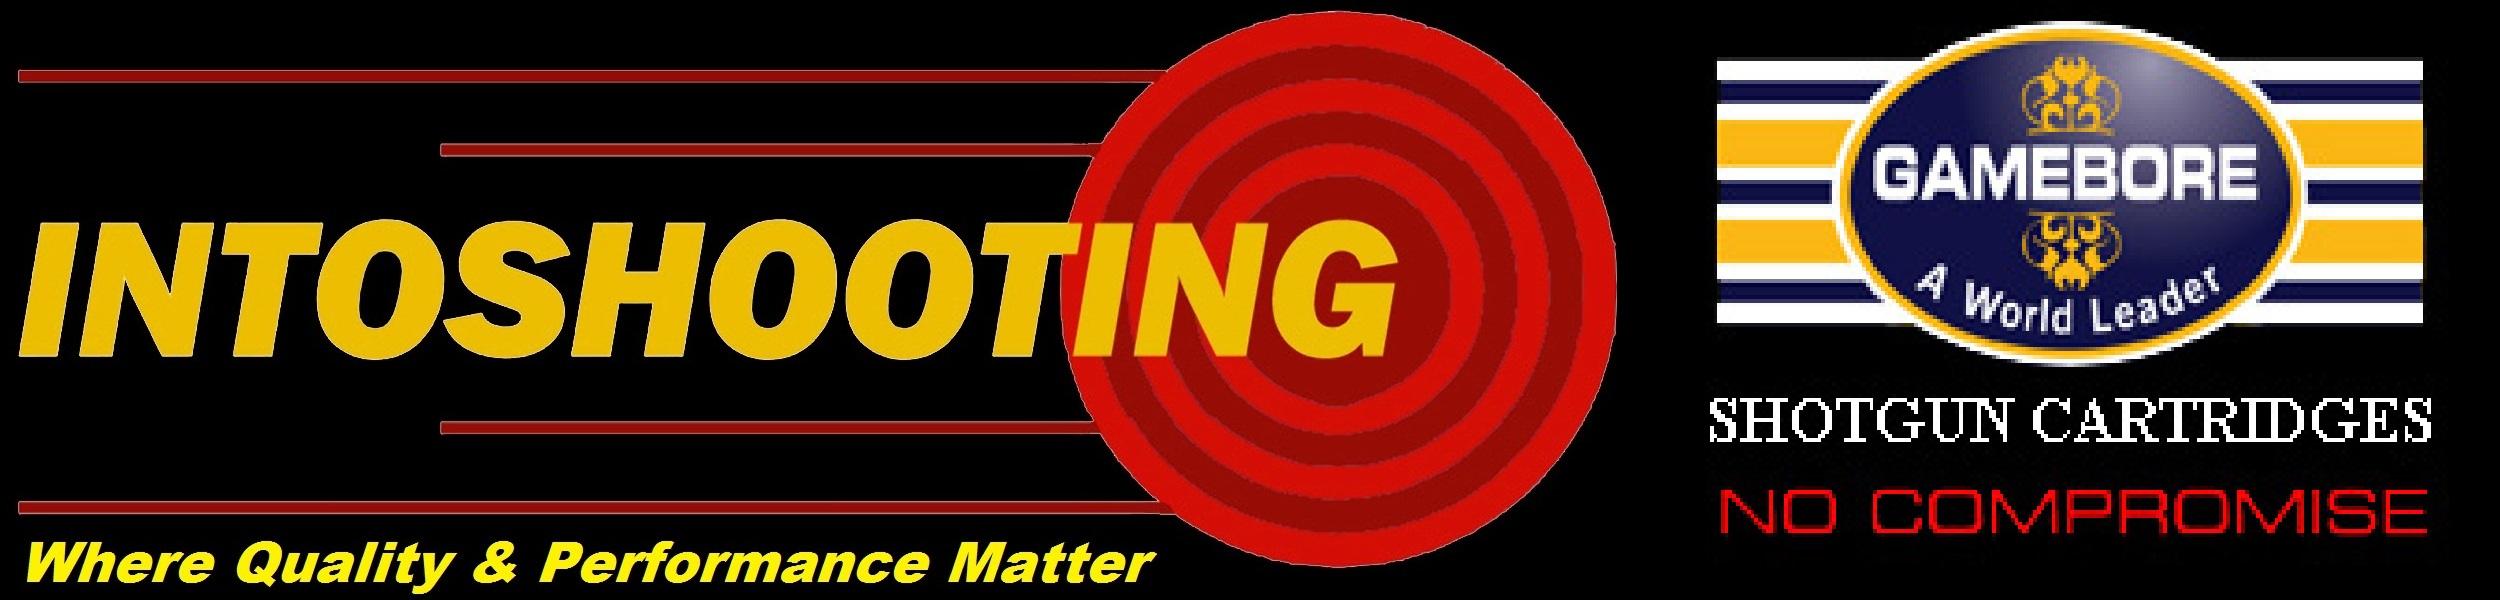 logo_ShootingNEW1 black 33.jpg